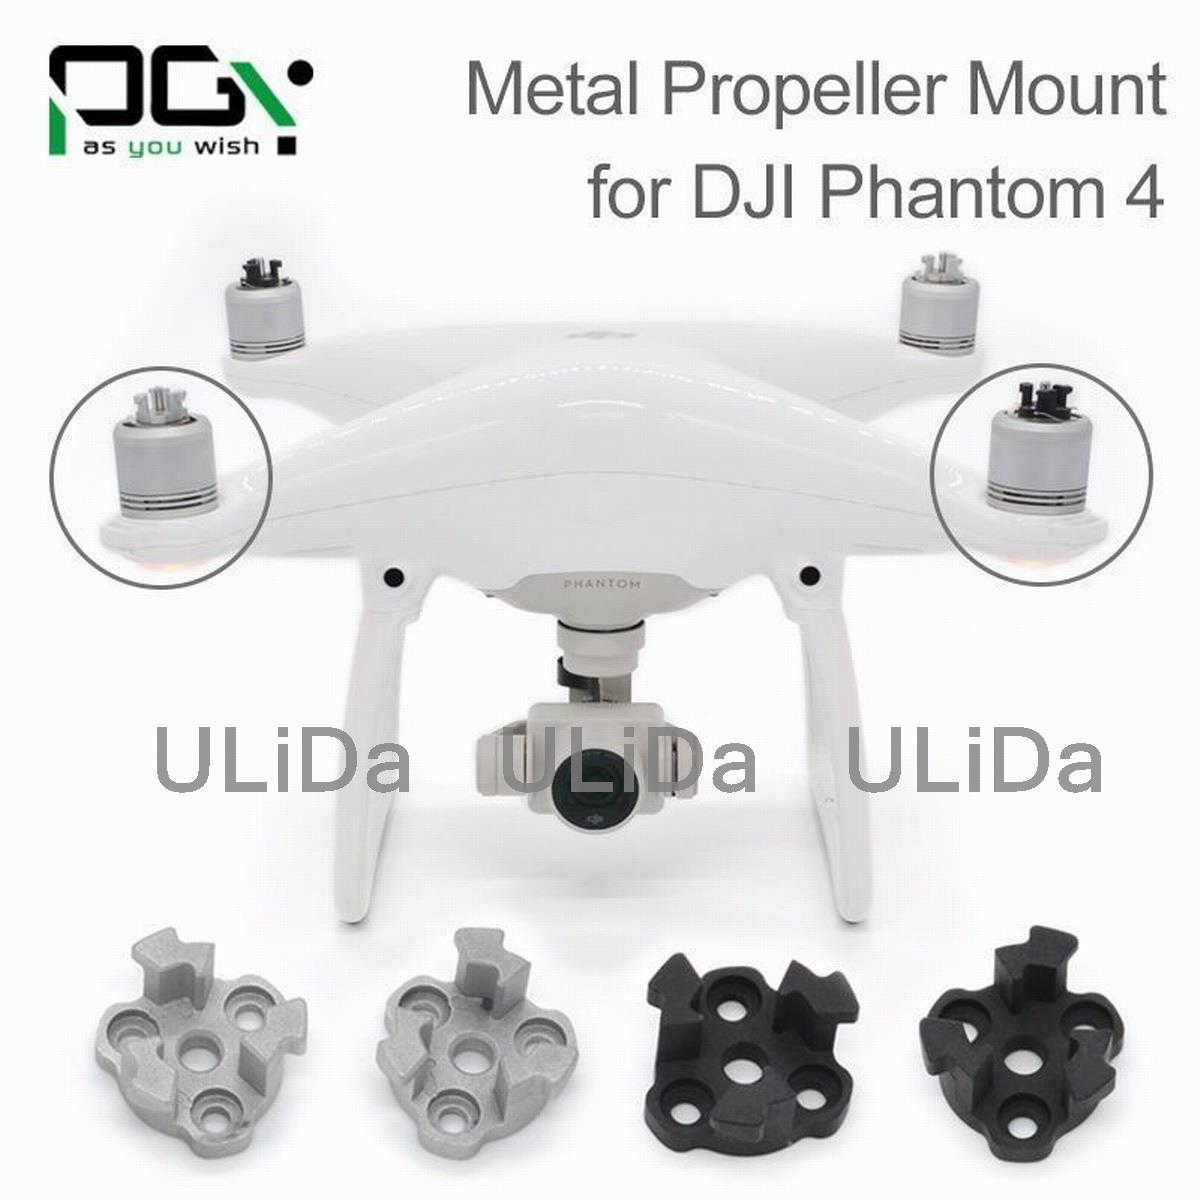 DJI Phantom 4 Drone Holder Adapter motor connector Metal Propeller Bracket Mount